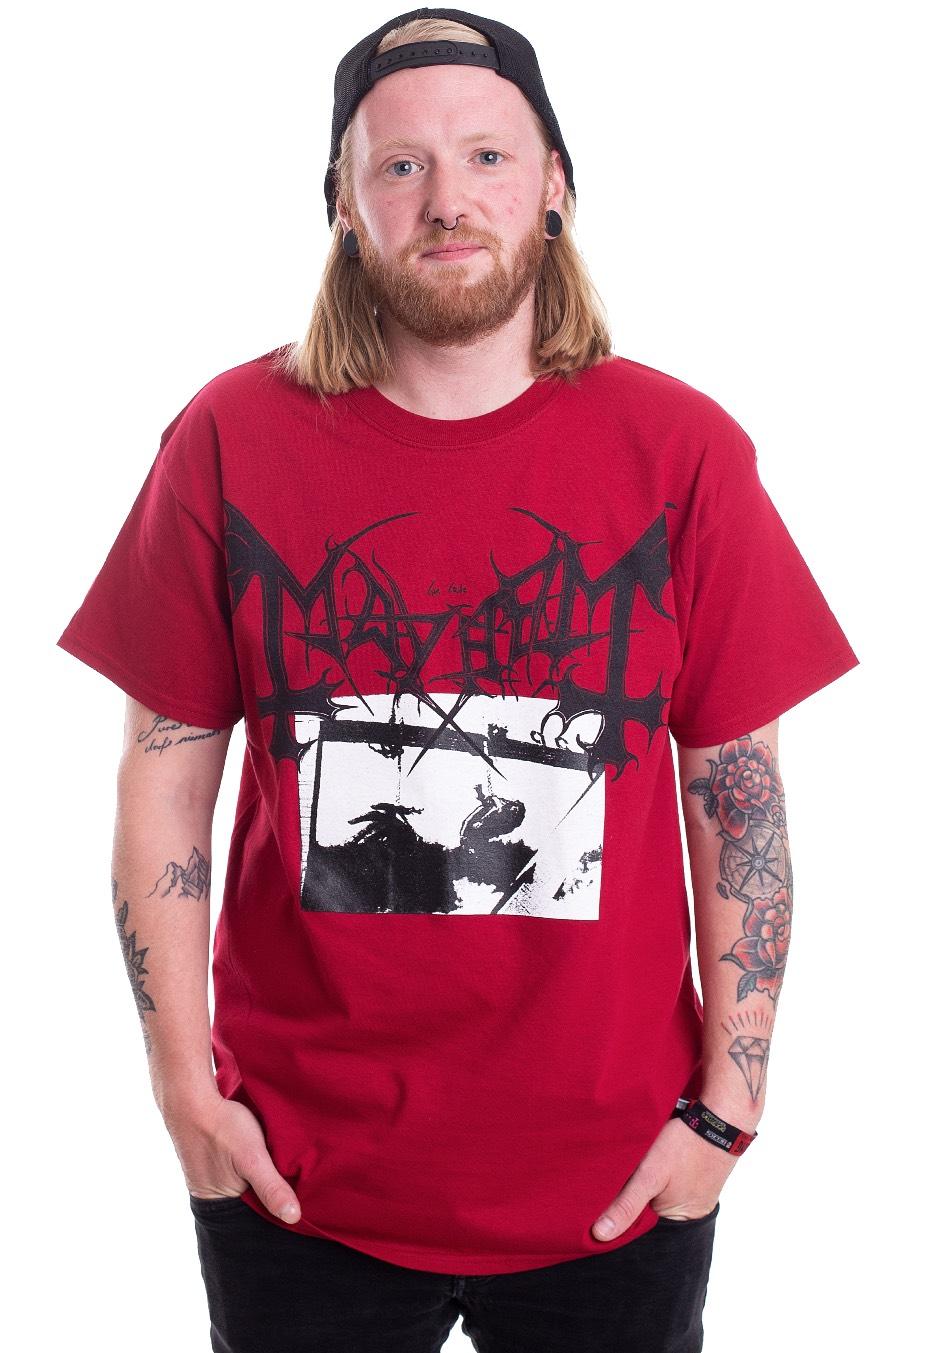 Mayhem Deathcrush Official Merchandise New /& Size Black Metal T-Shirt Men/'s Red